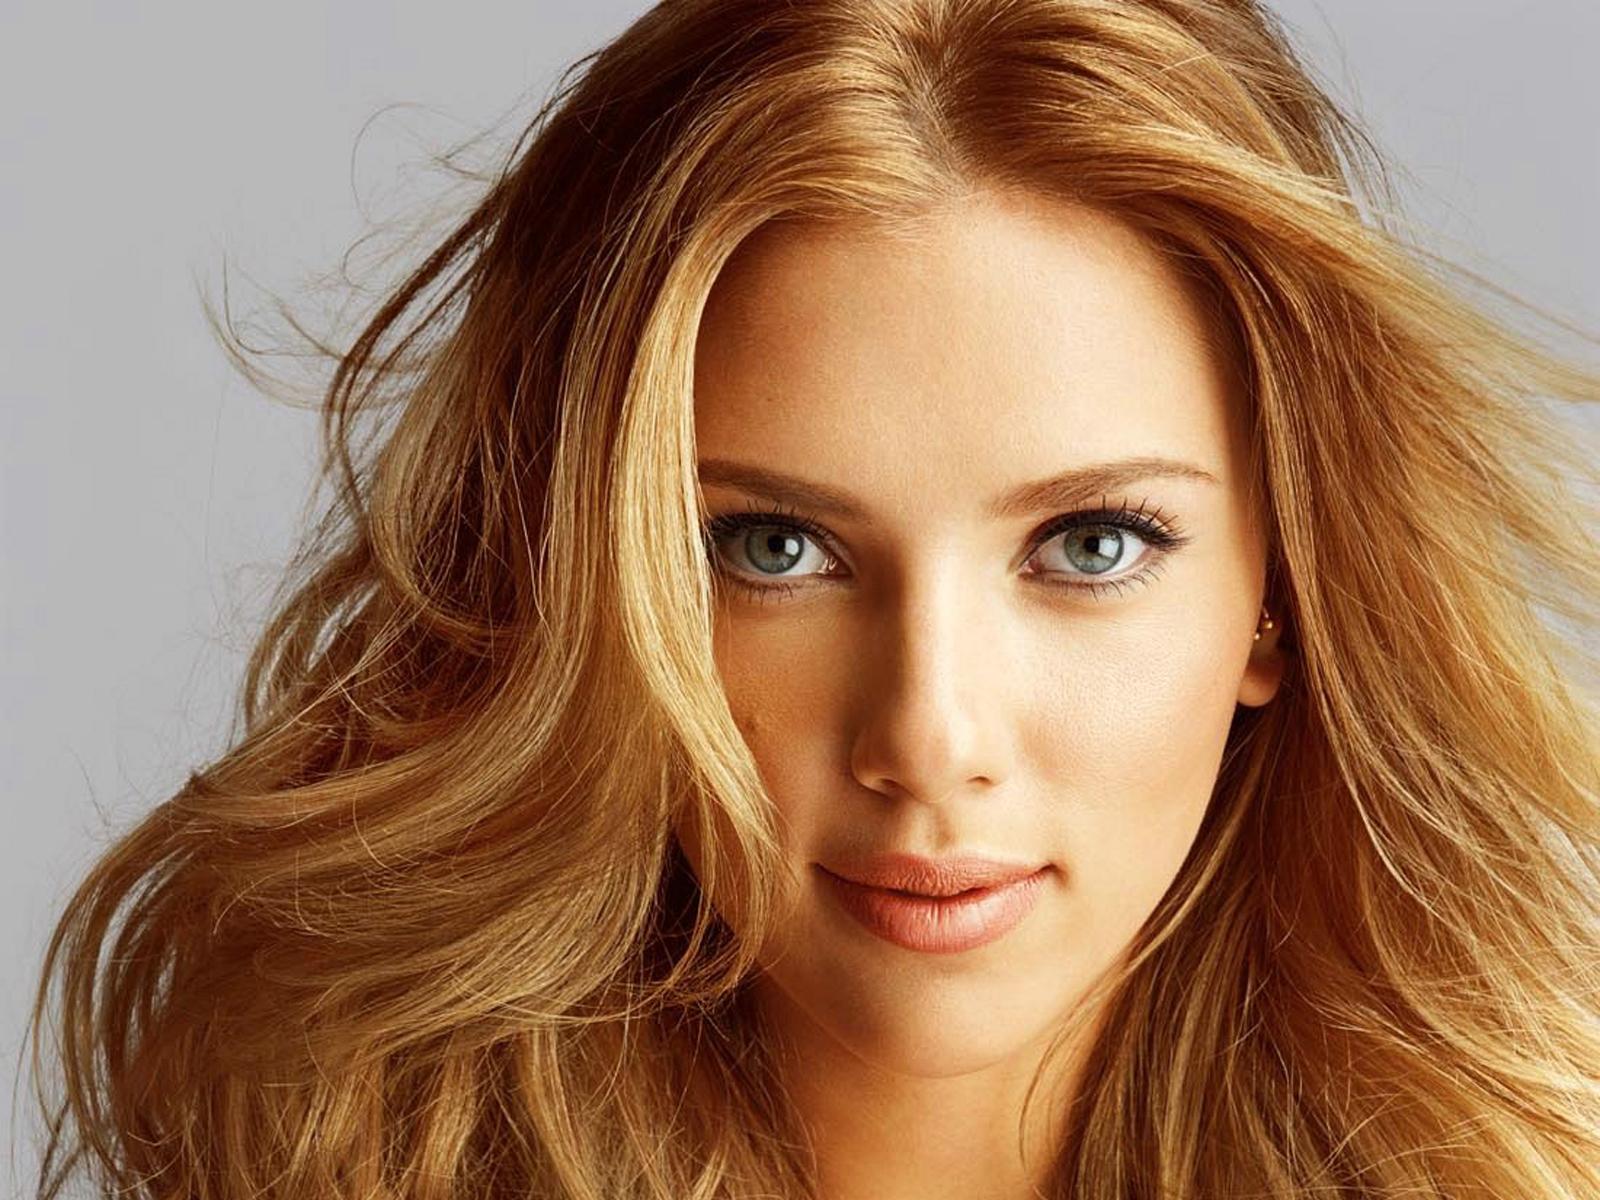 Scarlett Johansson Portrait Wallpapers Wallpaper Cave